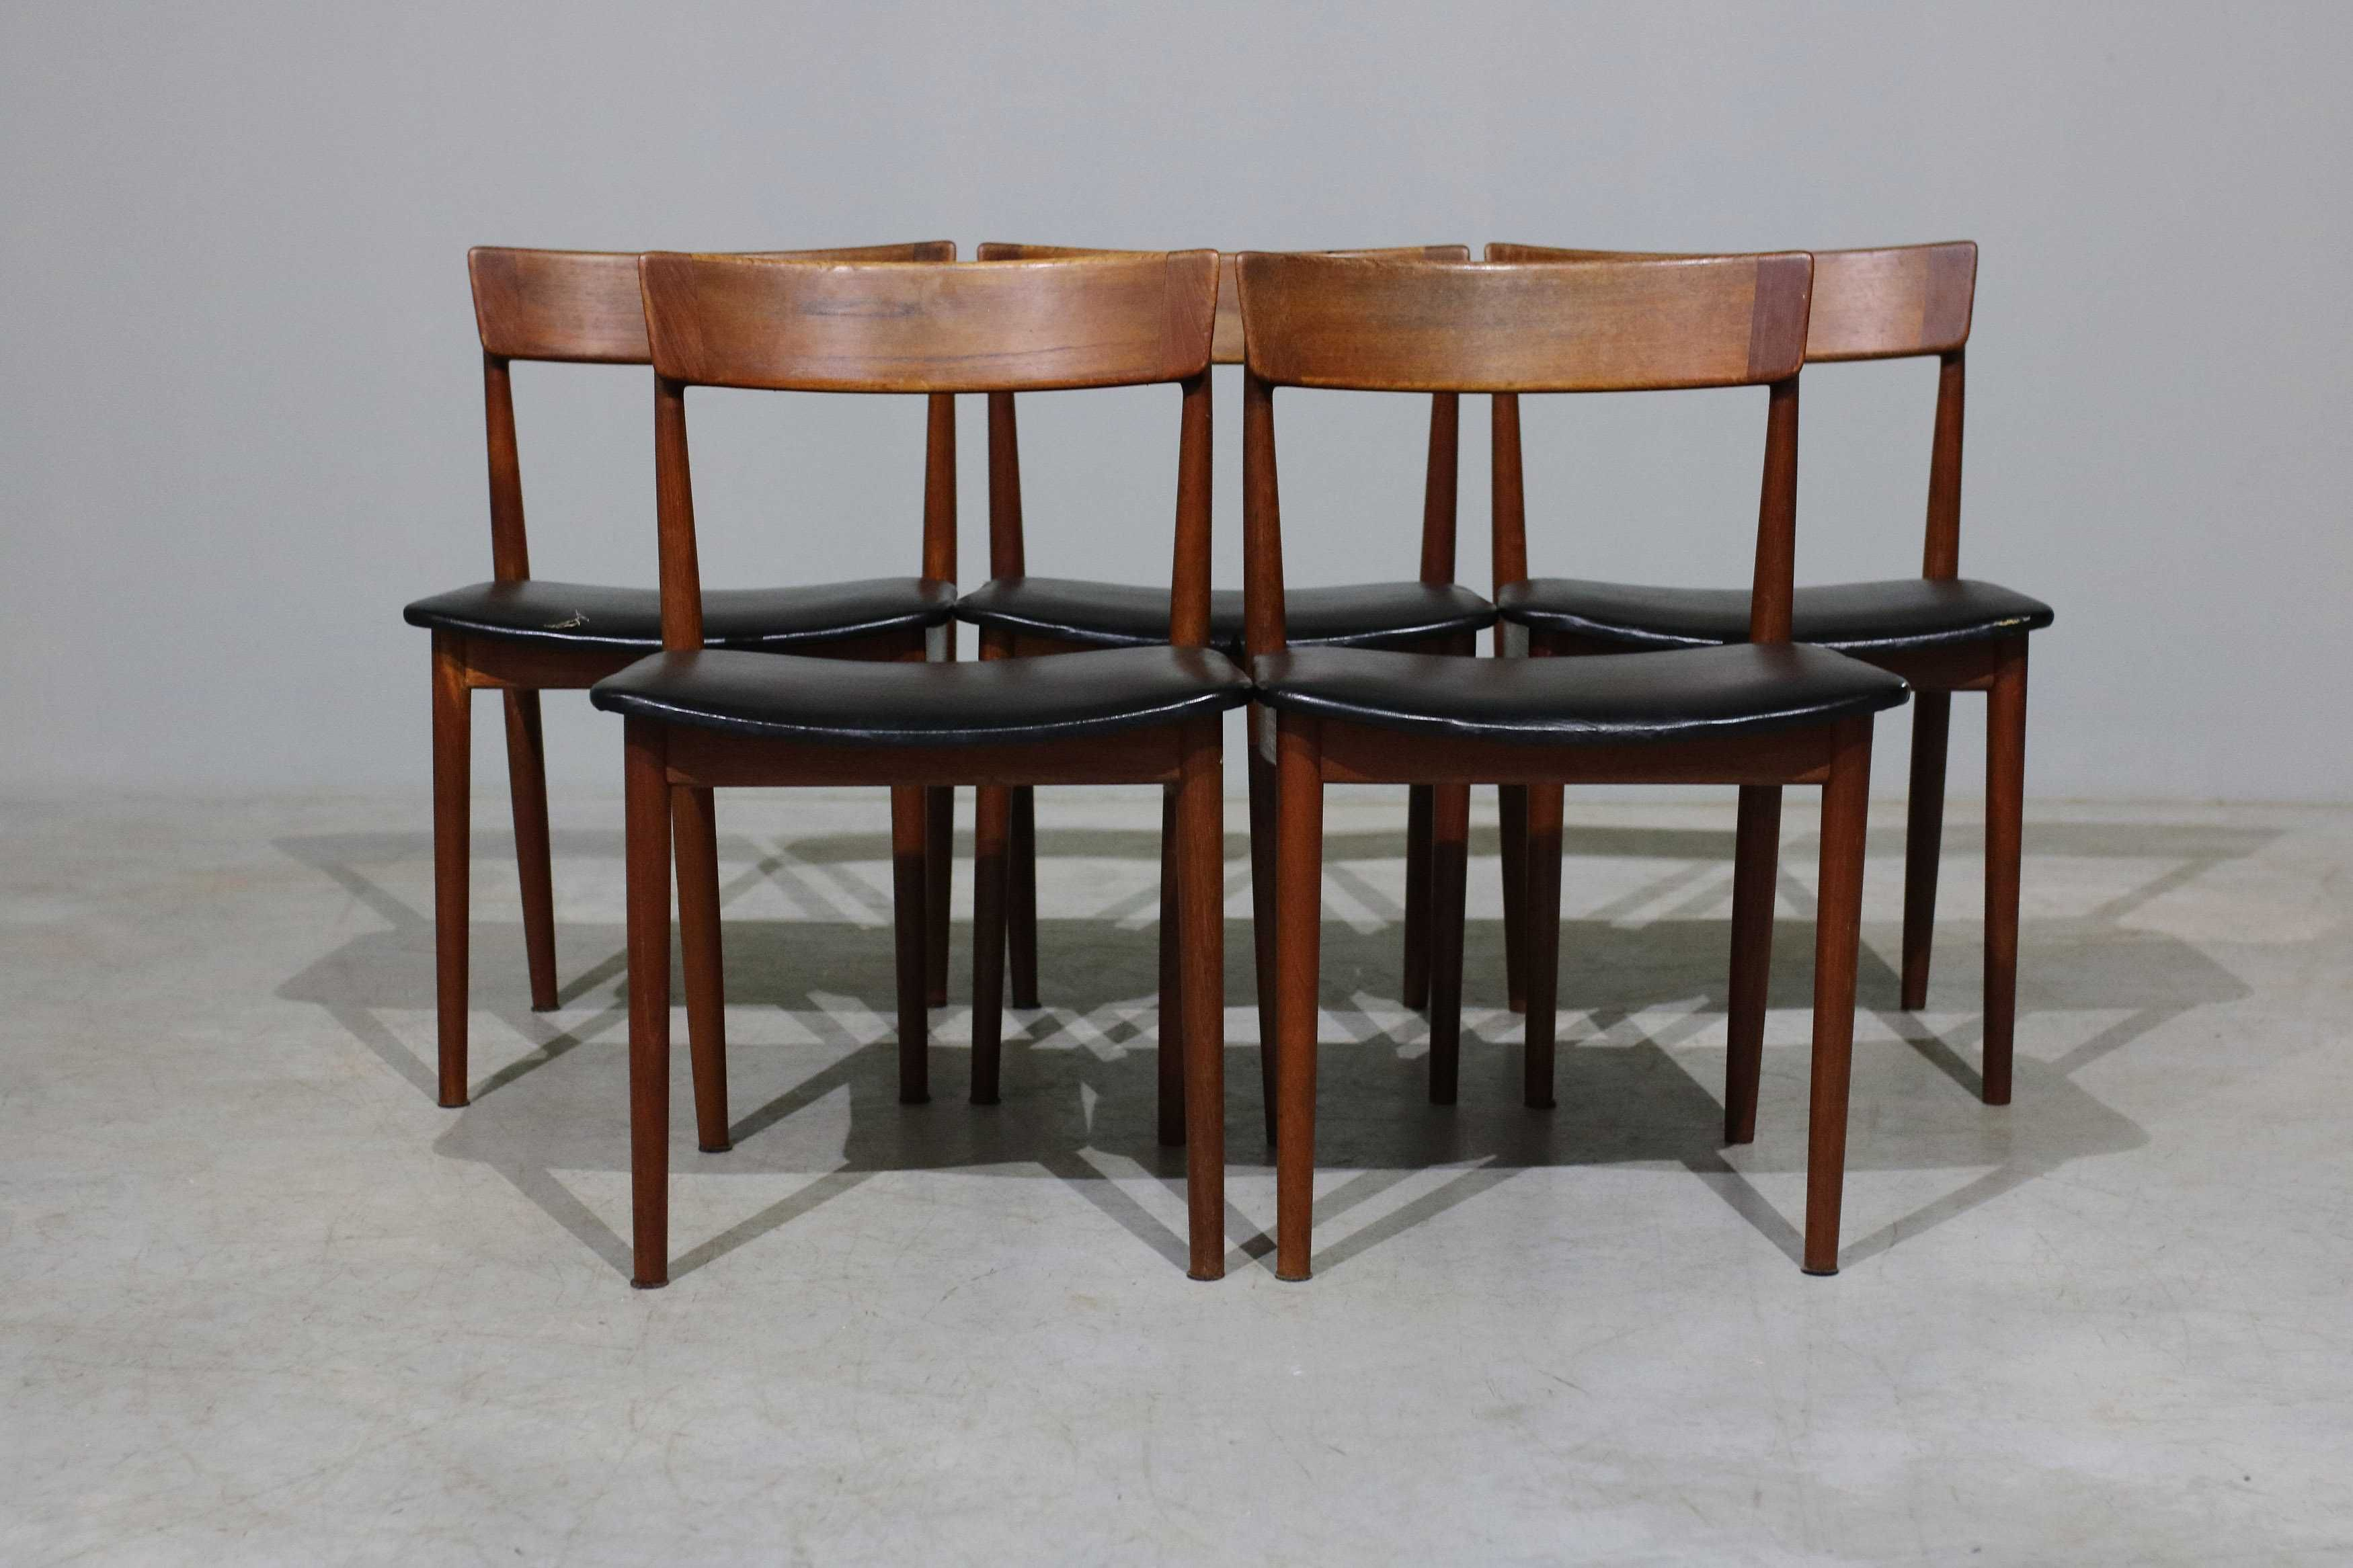 Cadeiras Henry Rosengren Hansen em teca | Móveis vintage